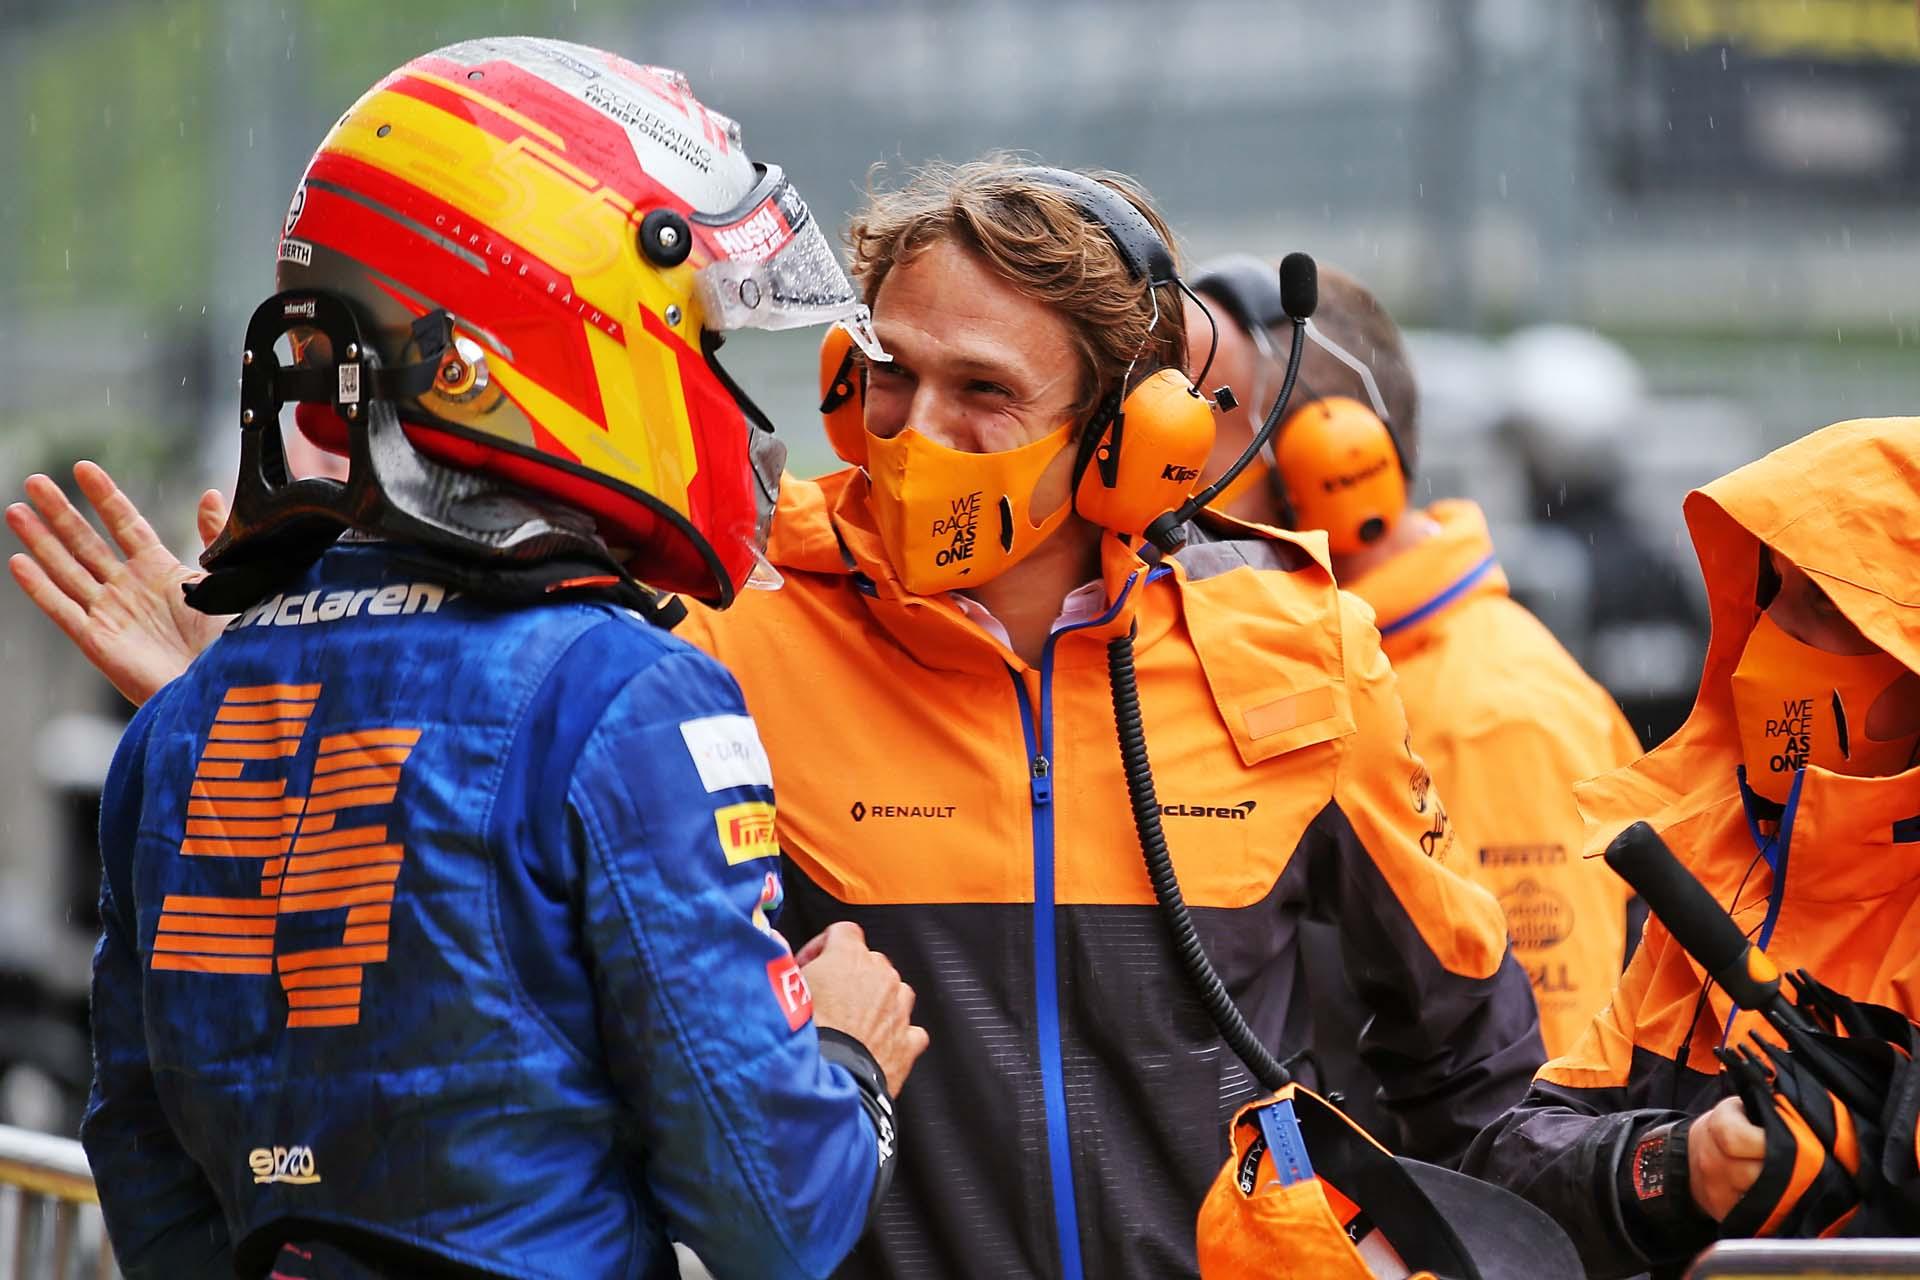 Carlos Sainz, McLaren, is congratulated after qualifying